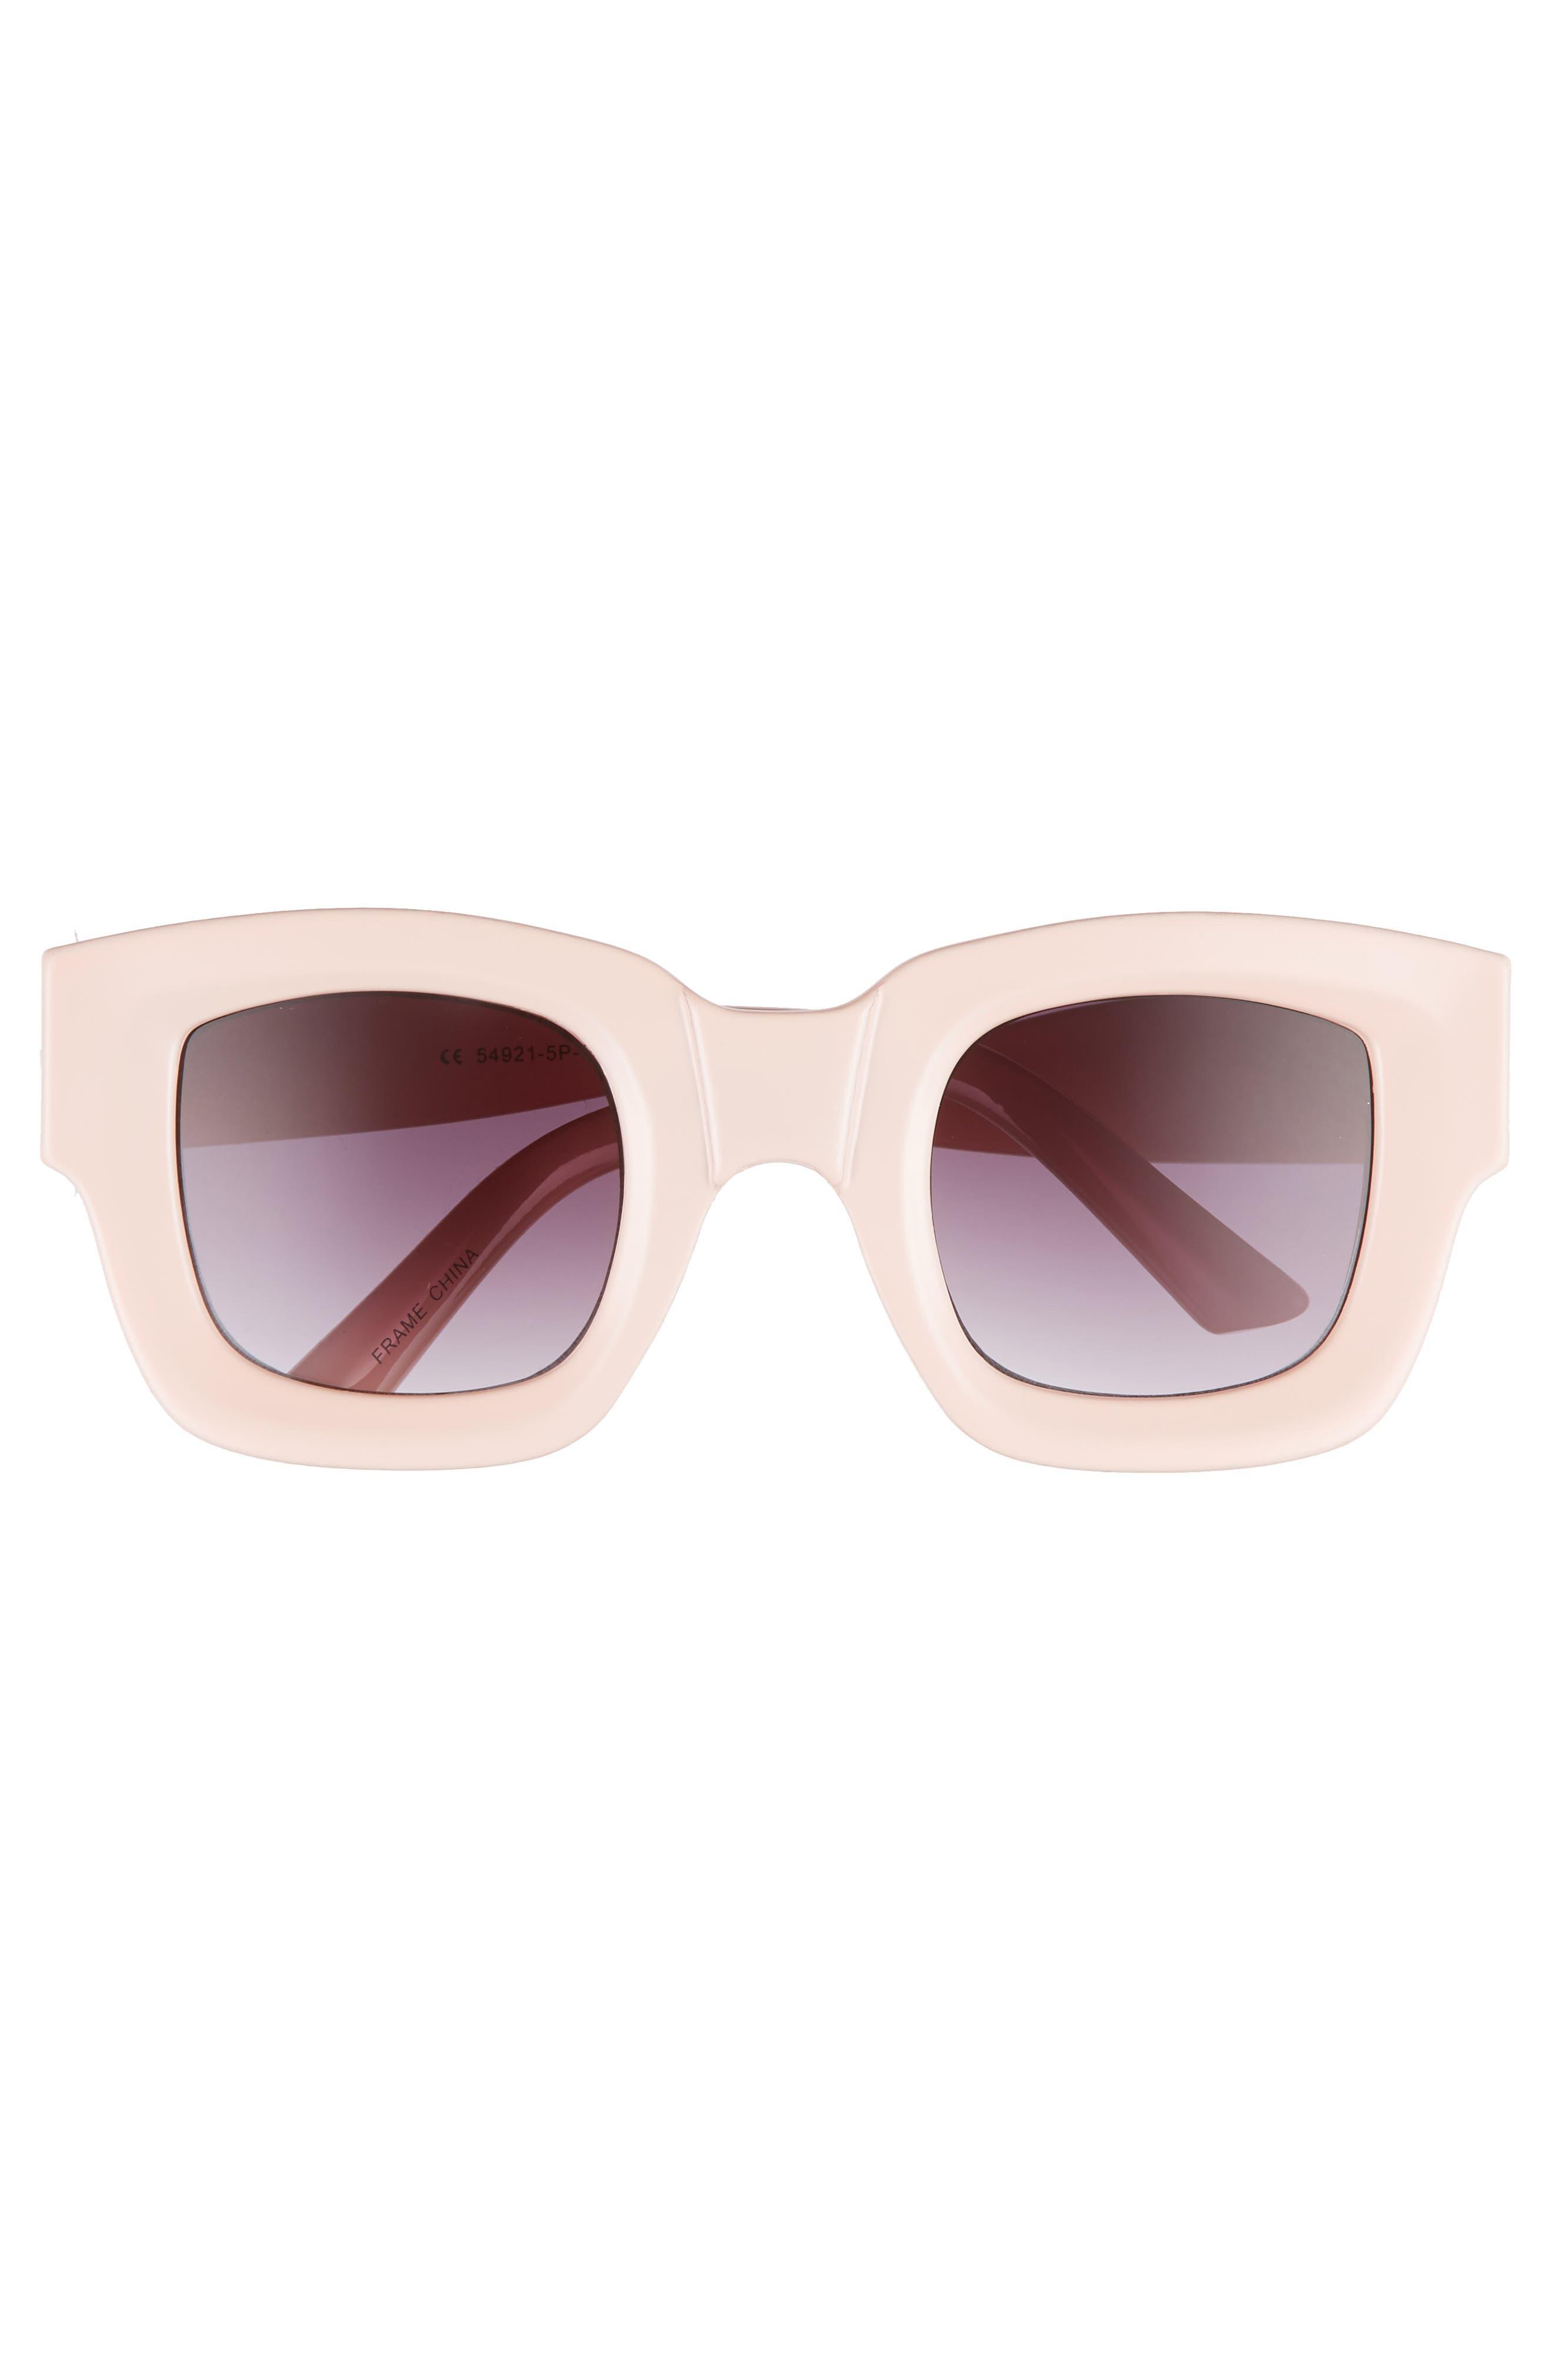 45mm Square Sunglasses,                             Alternate thumbnail 3, color,                             PALE PINK